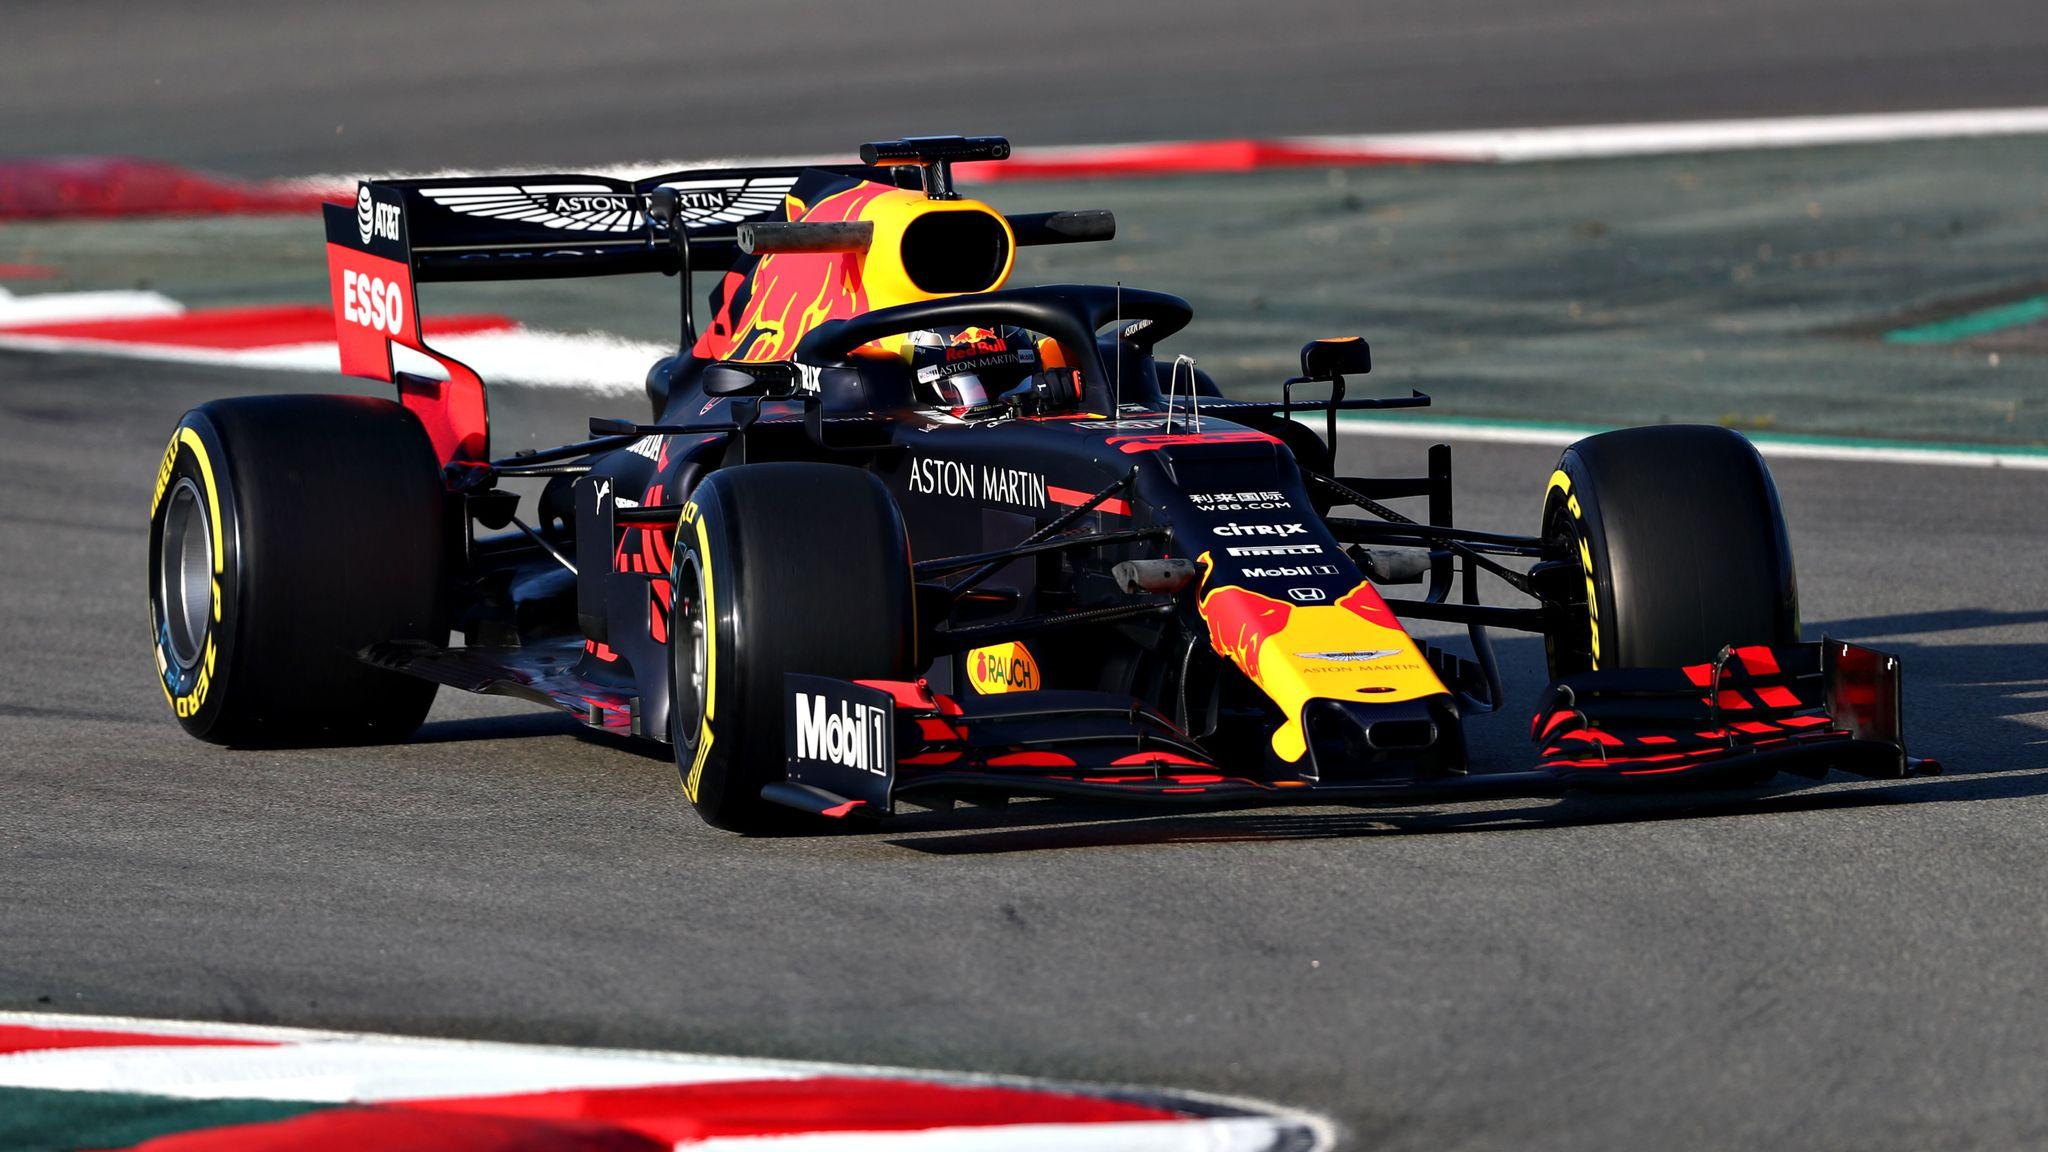 F1 2019: Introducing the new Formula 1 cars   F1 News